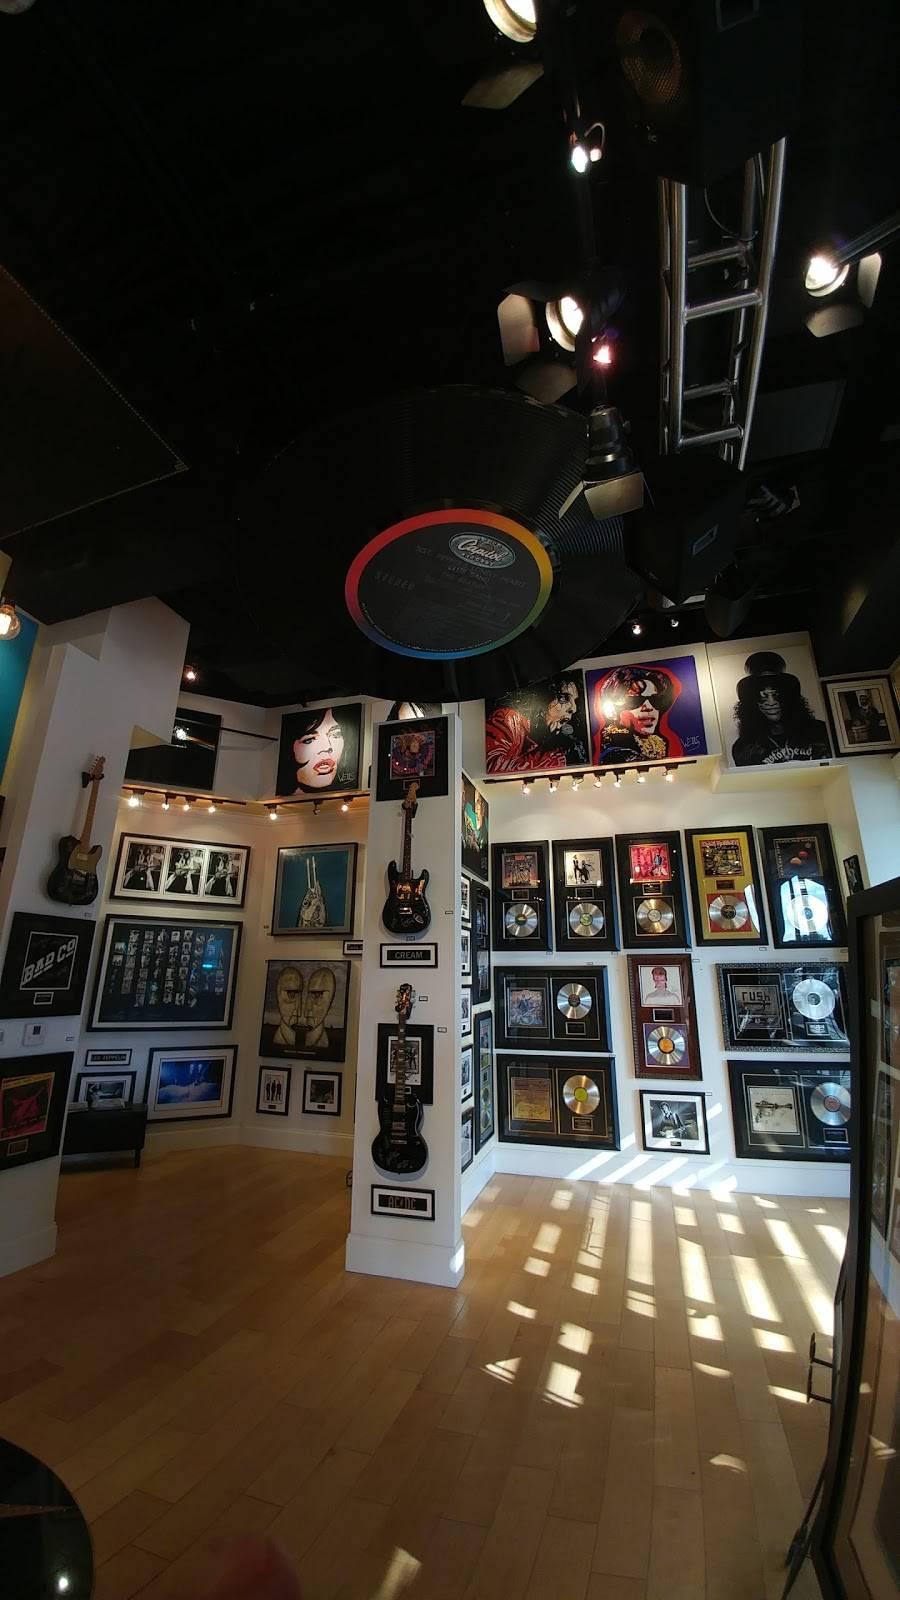 ROCK STAR gallery - shopping mall  | Photo 5 of 7 | Address: 15211 N Kierland Blvd #160, Scottsdale, AZ 85254, USA | Phone: (480) 275-4501